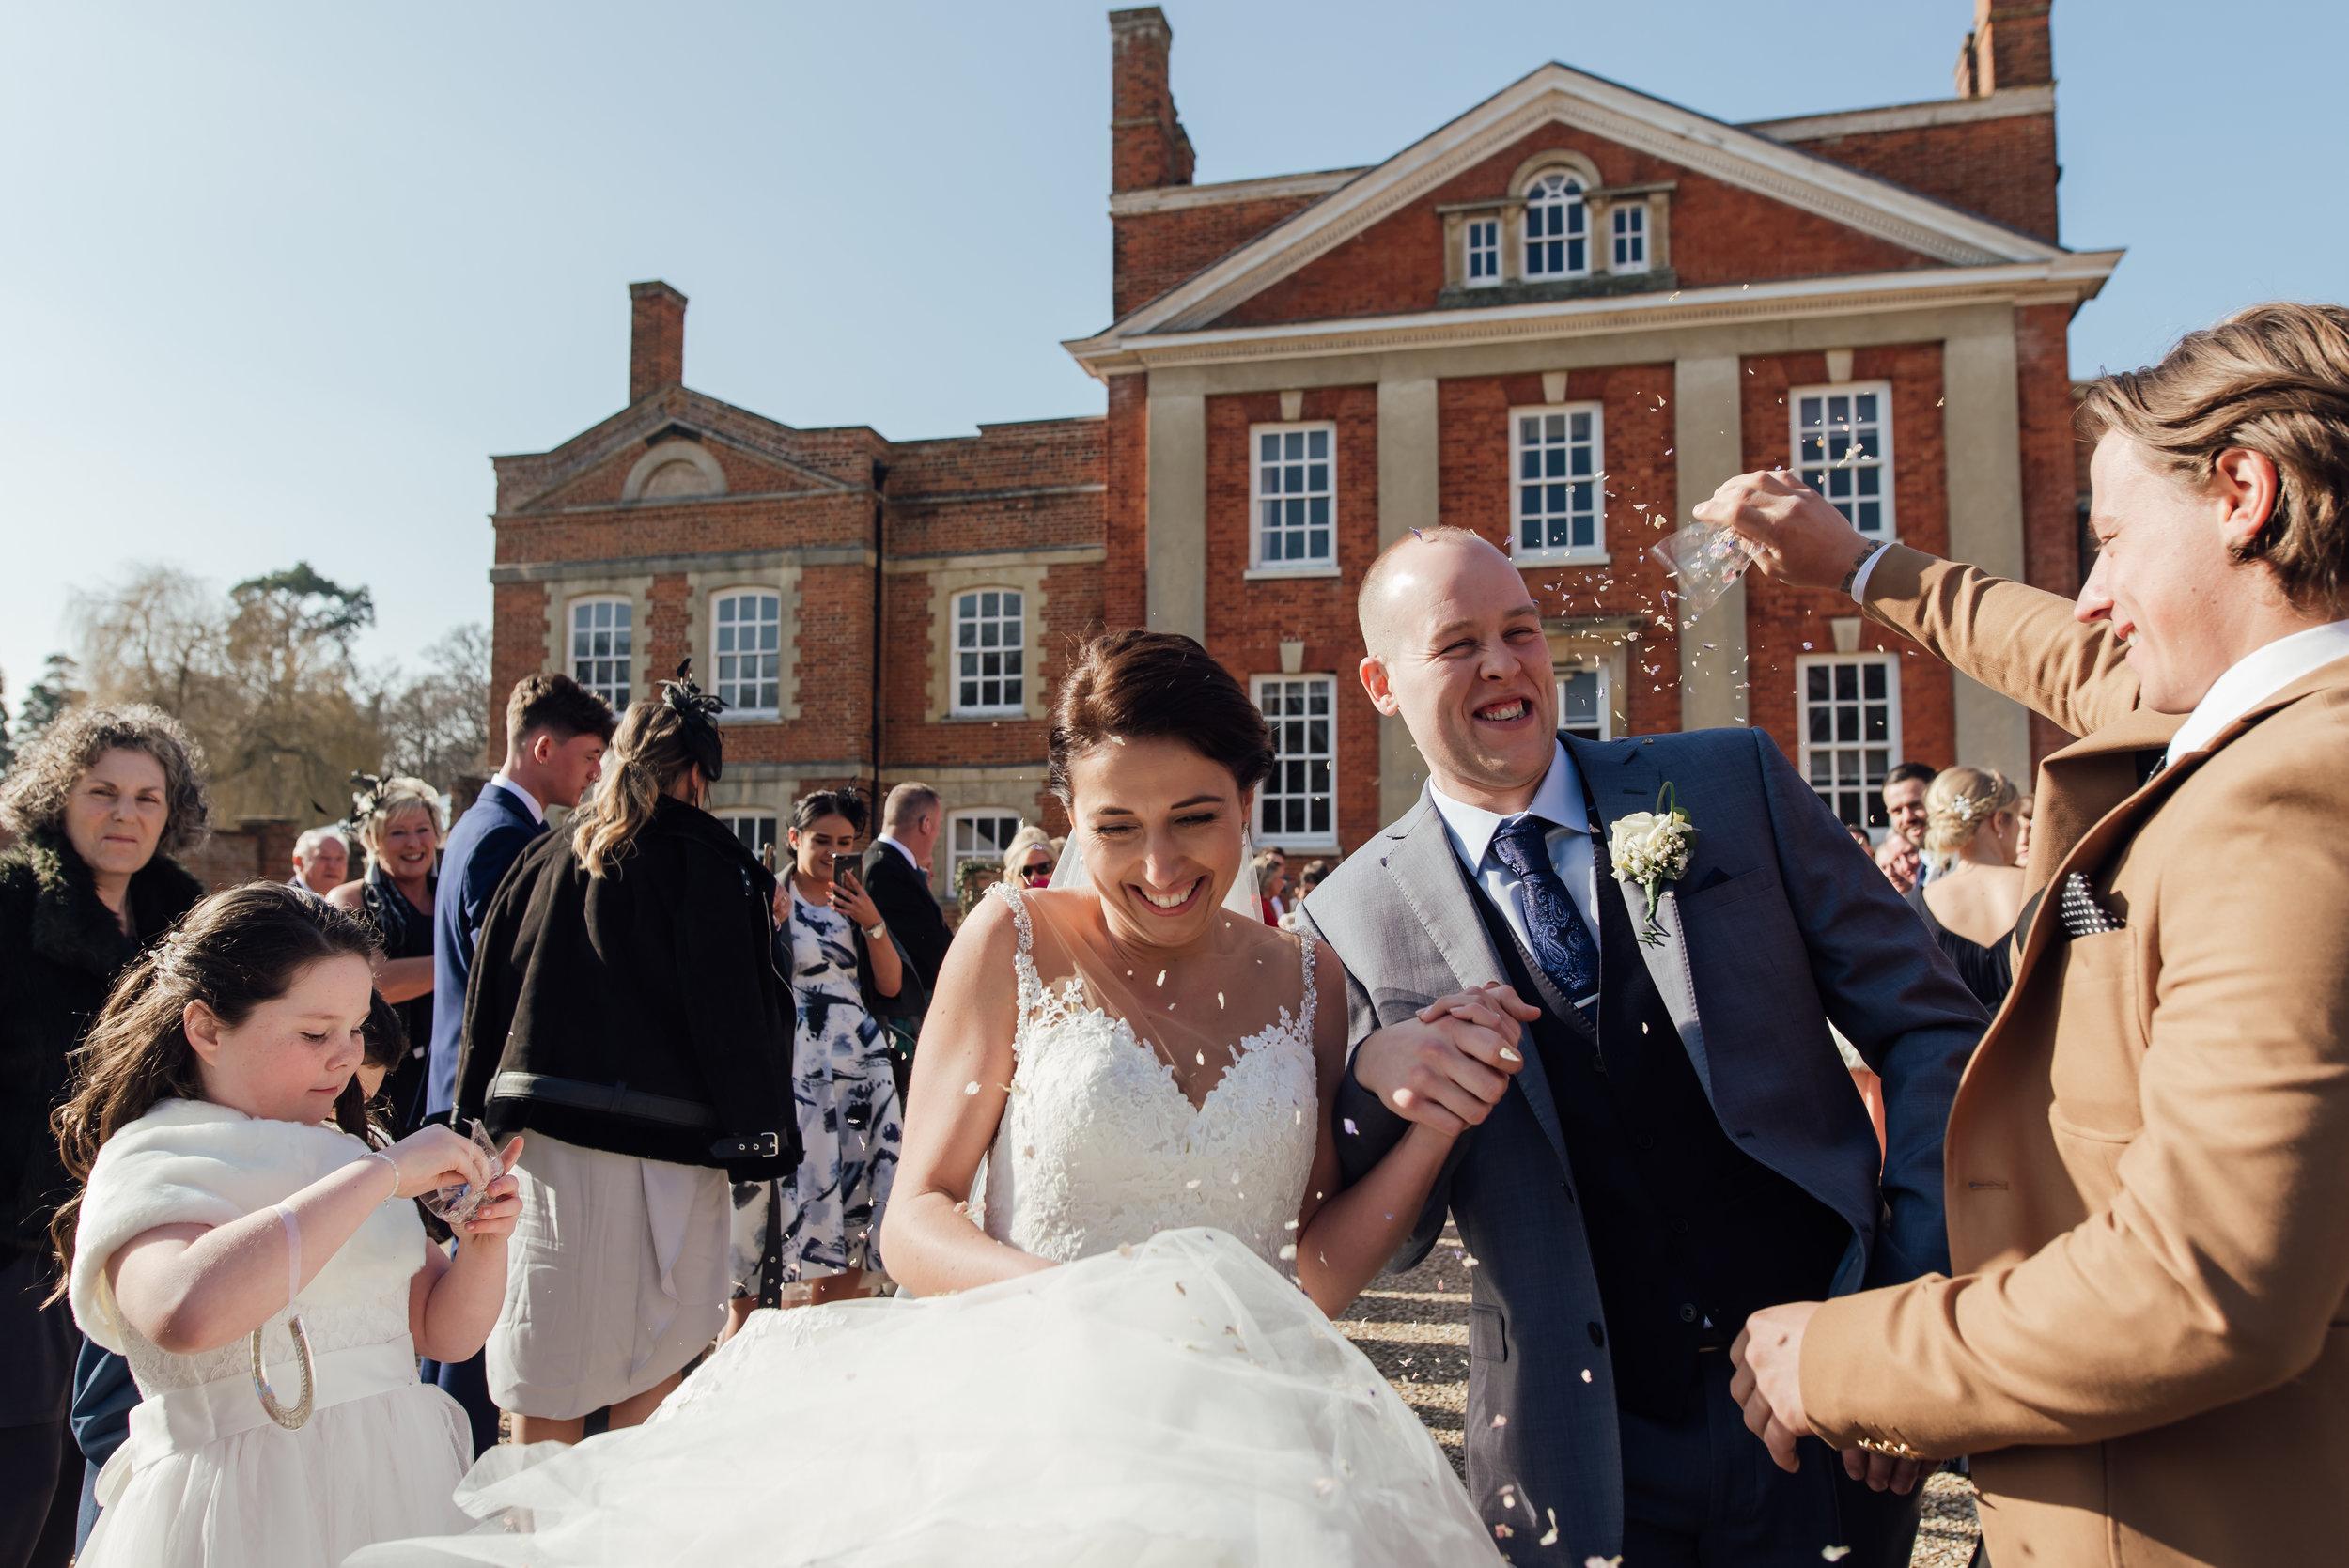 Sarah-Fishlock-Photography-Hampshire-wedding-photographer : fleet-wedding-photographer-fleet : warbrook-house-wedding-venue : warbrook-house-wedding-photographer : hampshire-wedding-venue : hampshire-stately-home-wedding-venueWarbrook House-398.jpg